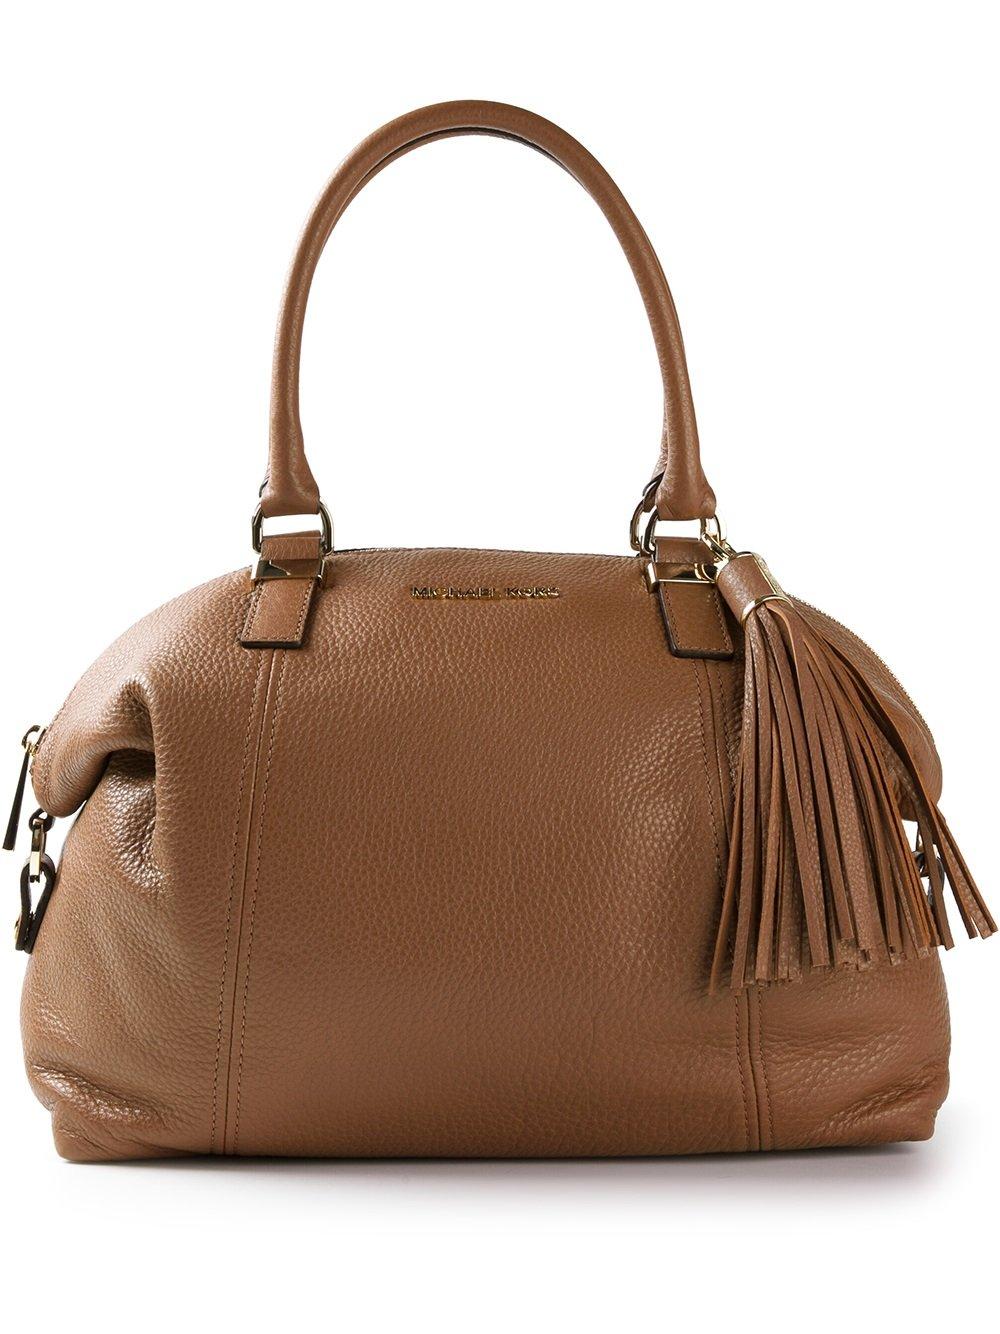 Lyst - Michael Michael Kors Tassel Shoulder Bag in Brown